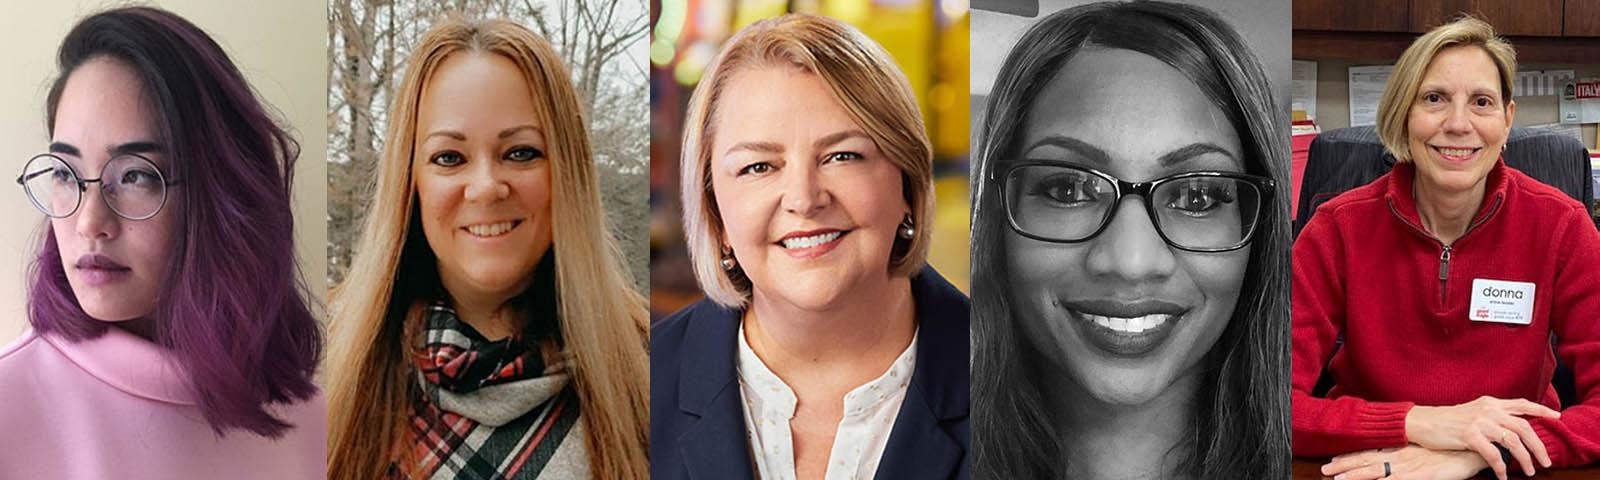 #TeamMemberTuesday<br><b>Women's History Month</b>